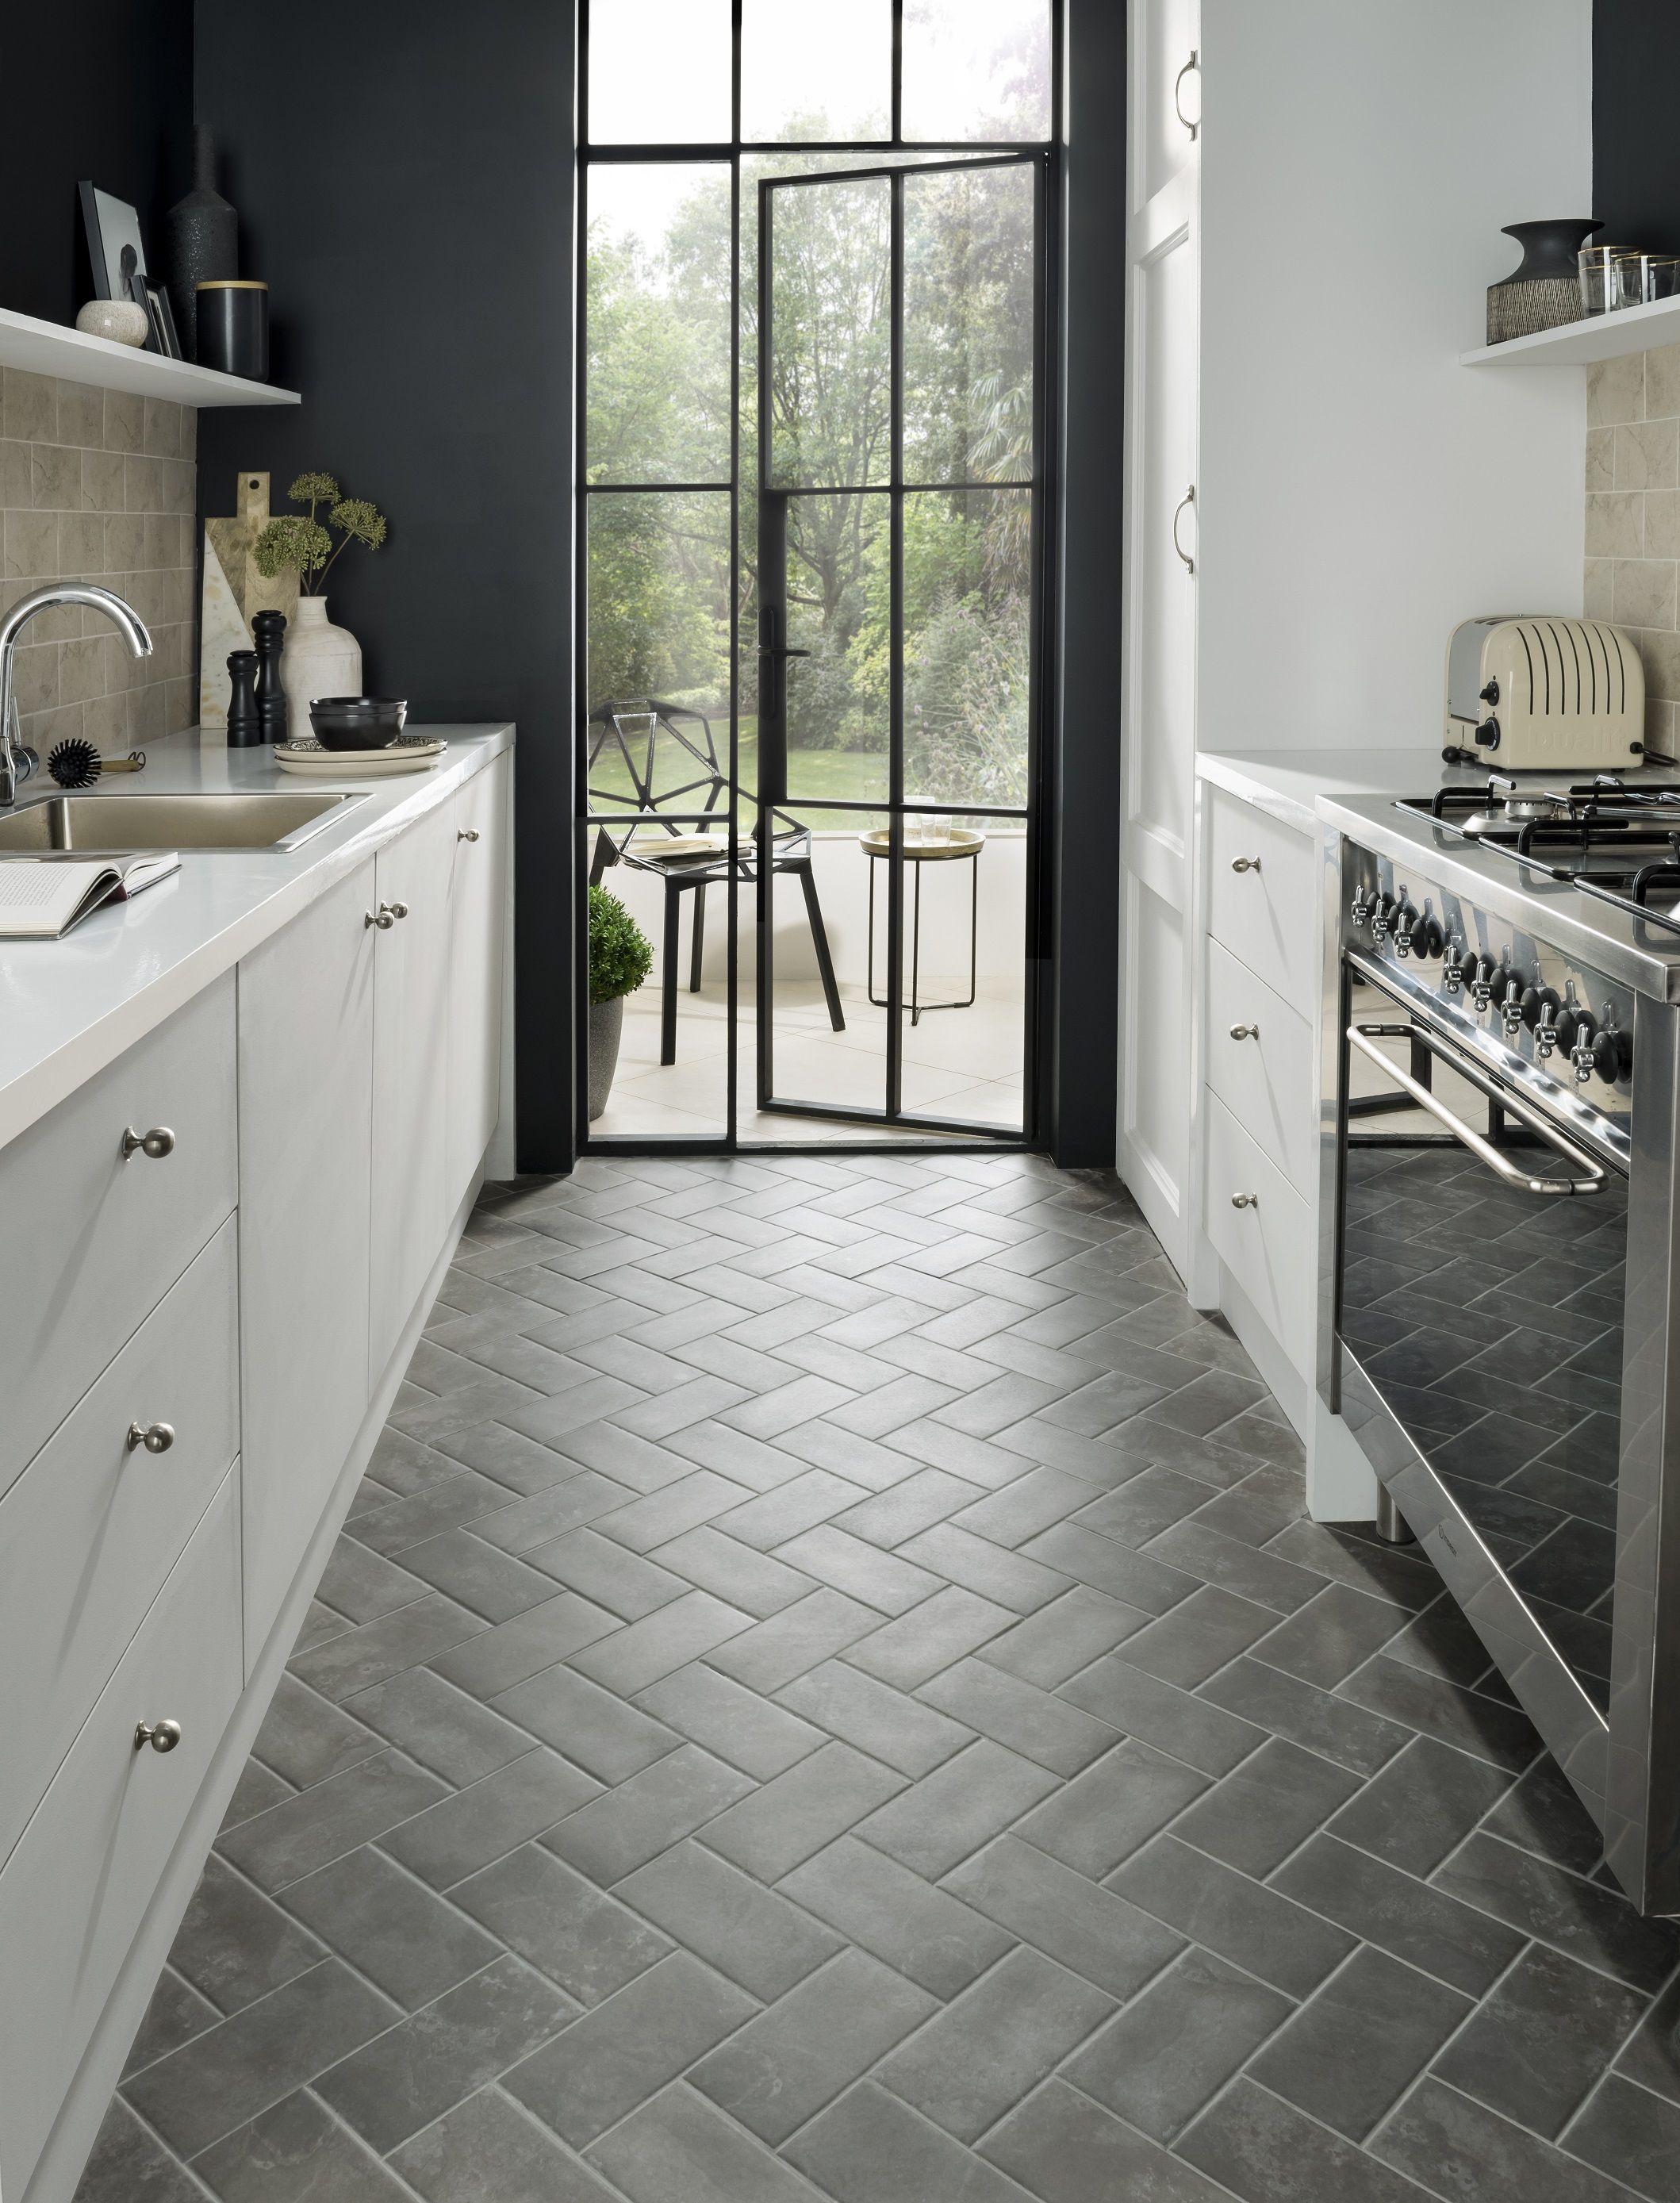 11 tile design ideas to make a small kitchen feel bigger ...